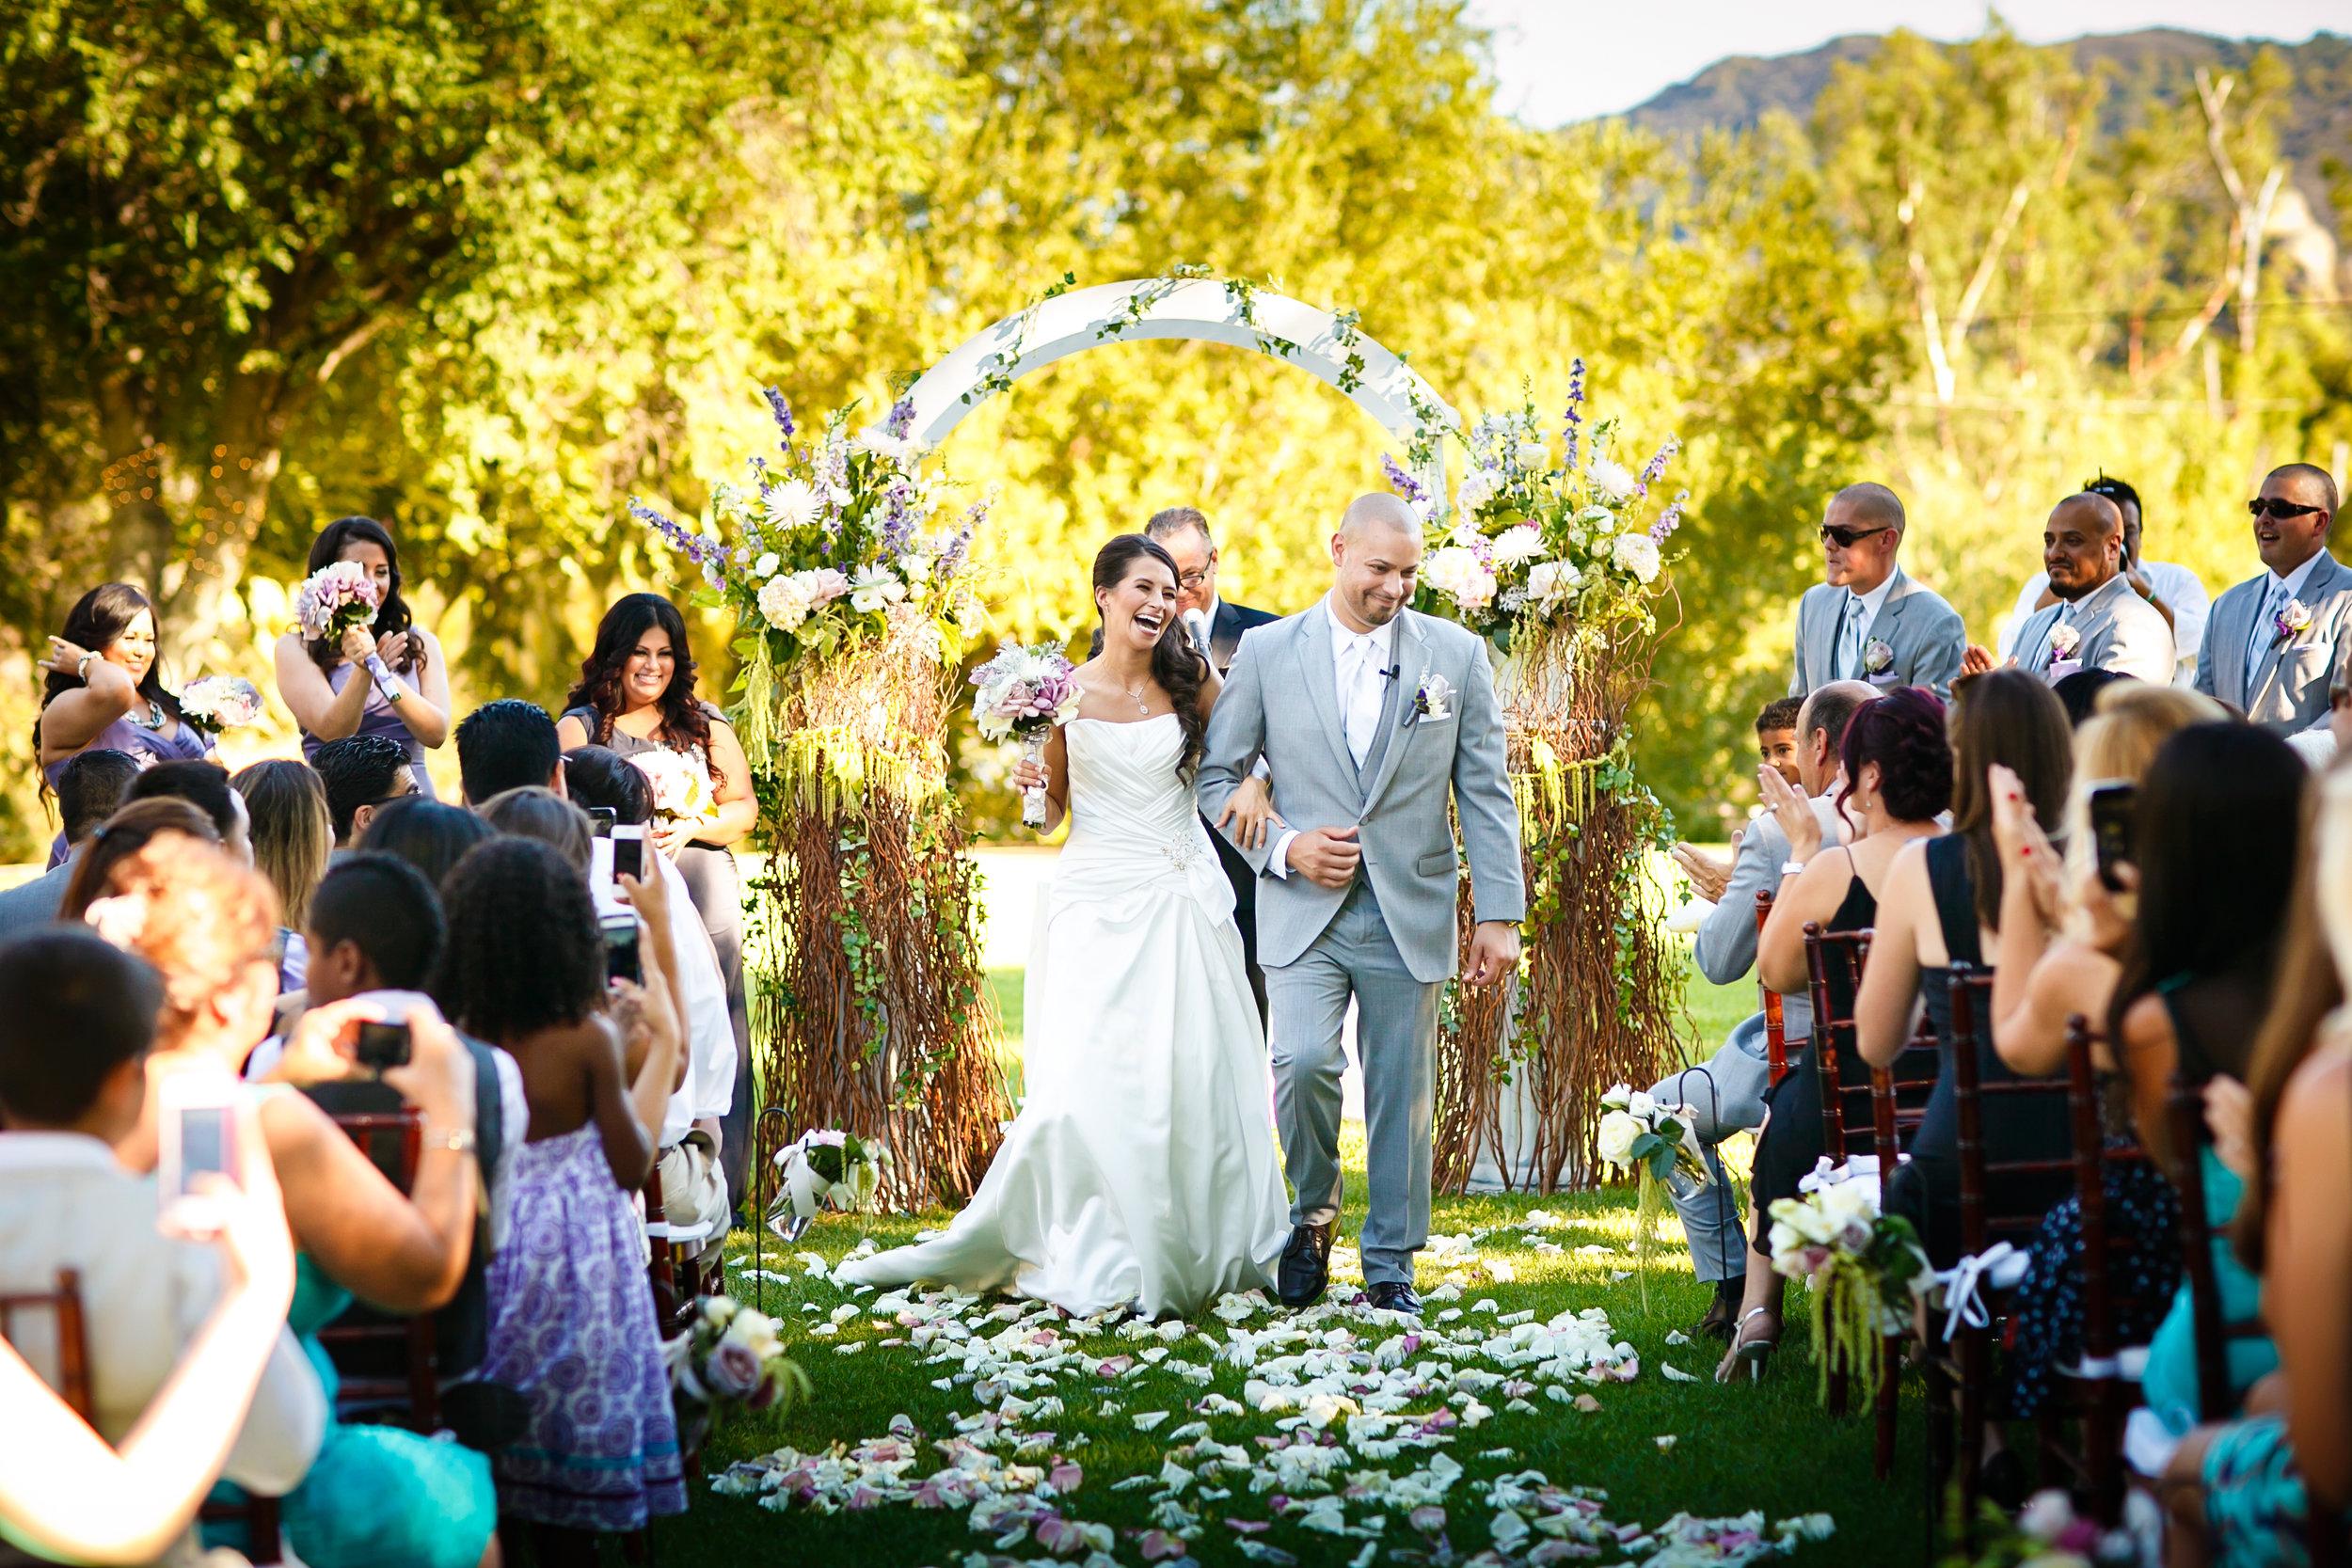 WEDDING CEREMONY AT MALIBOU LAKE IN MALIBU, CALIFORNIA